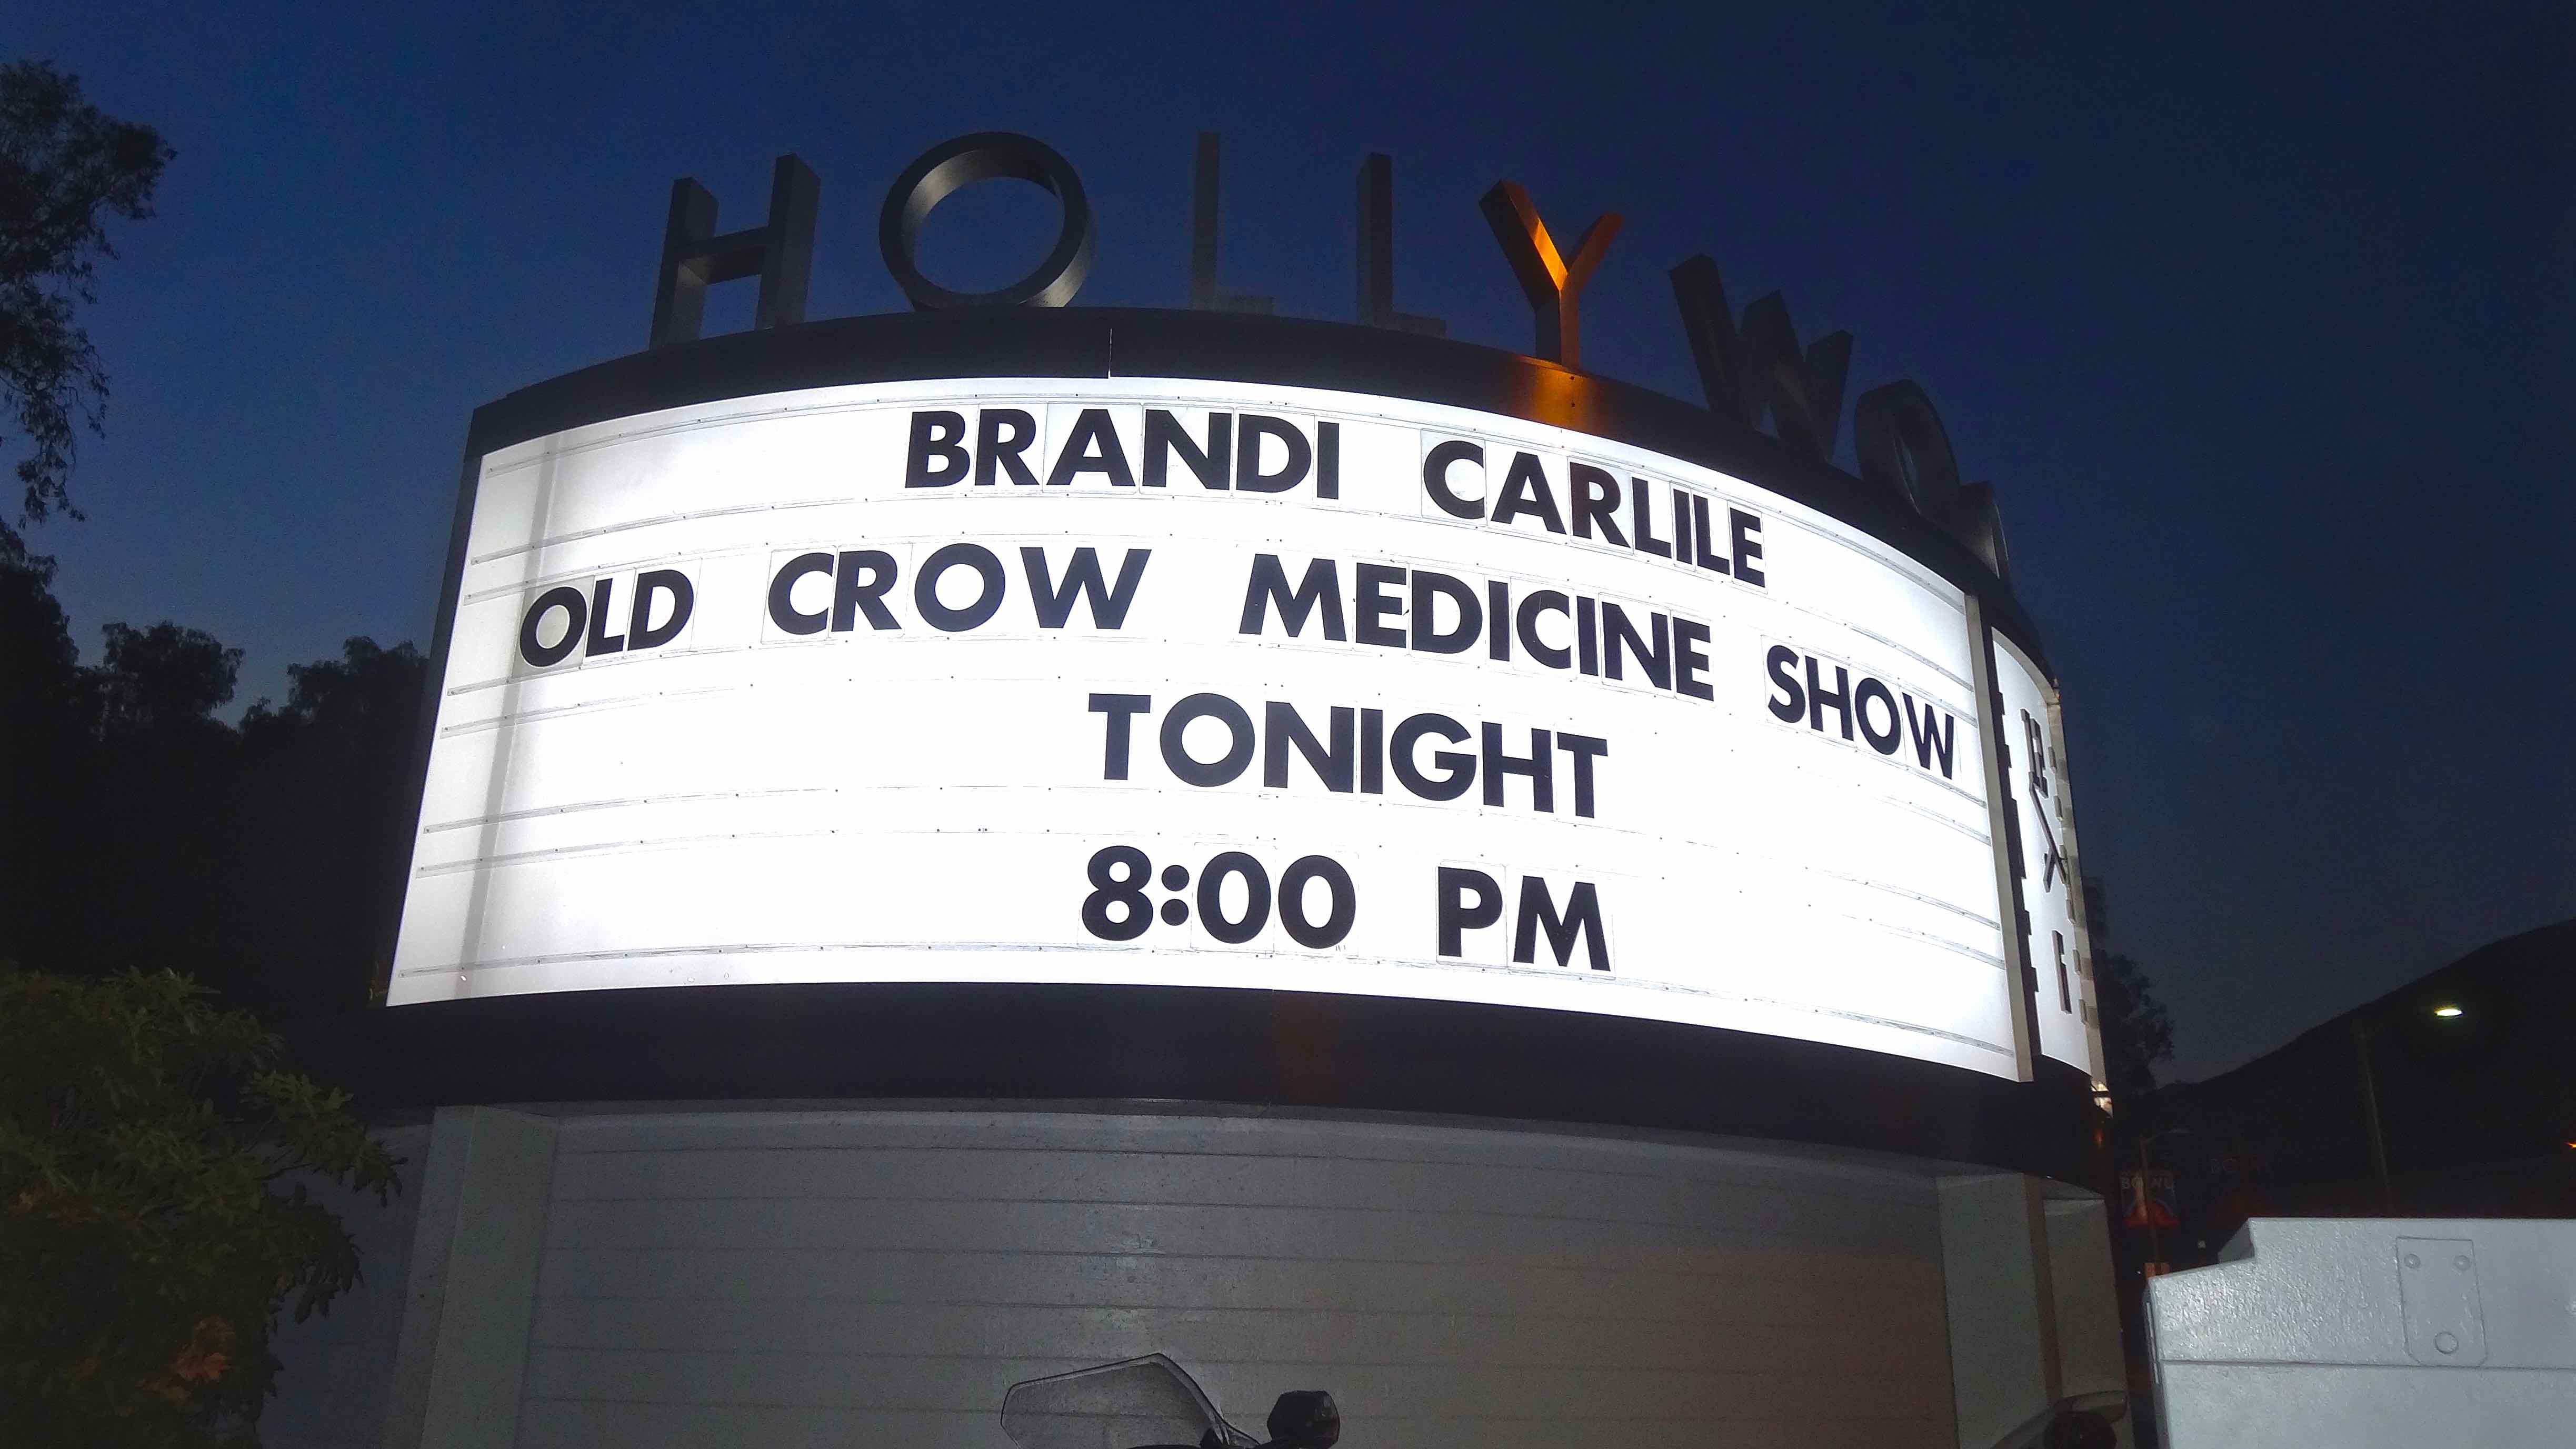 Brandi Carlil & Old Crow Medicine Show at The Hollywood Bowl 8/20/16.